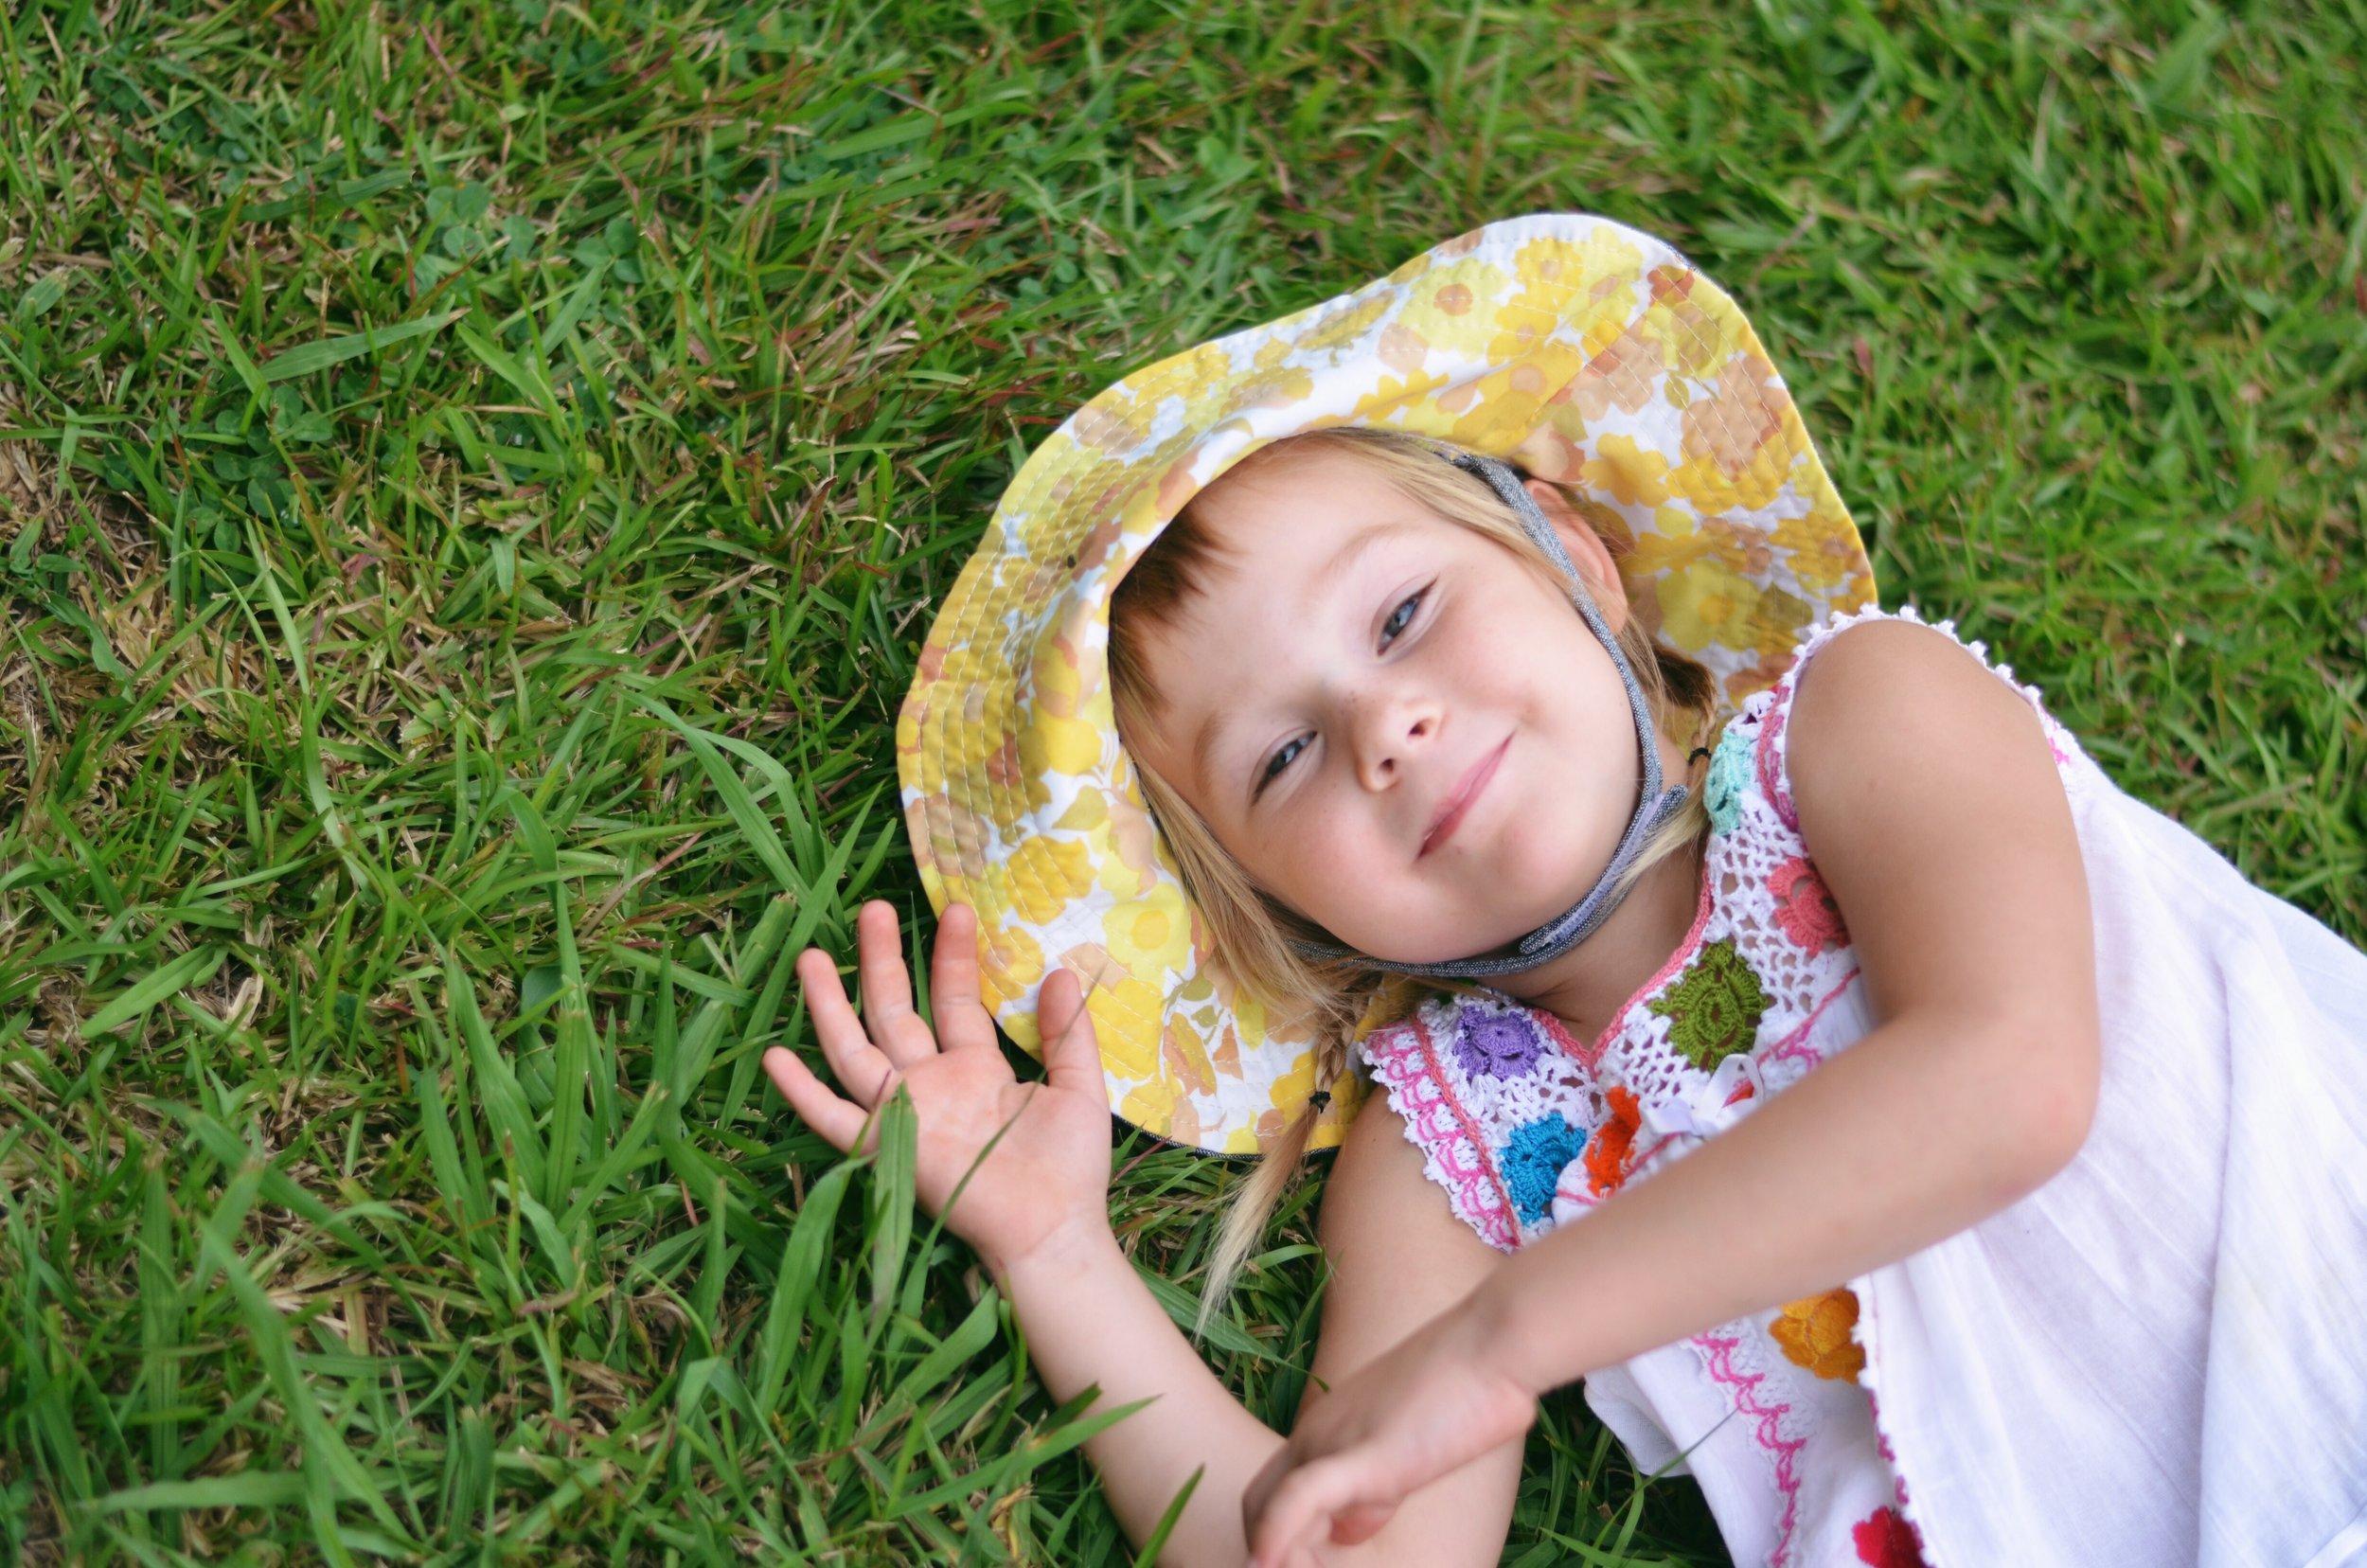 Denim Sun Hat for Girls Handmade by Blue Corduroy on Etsy